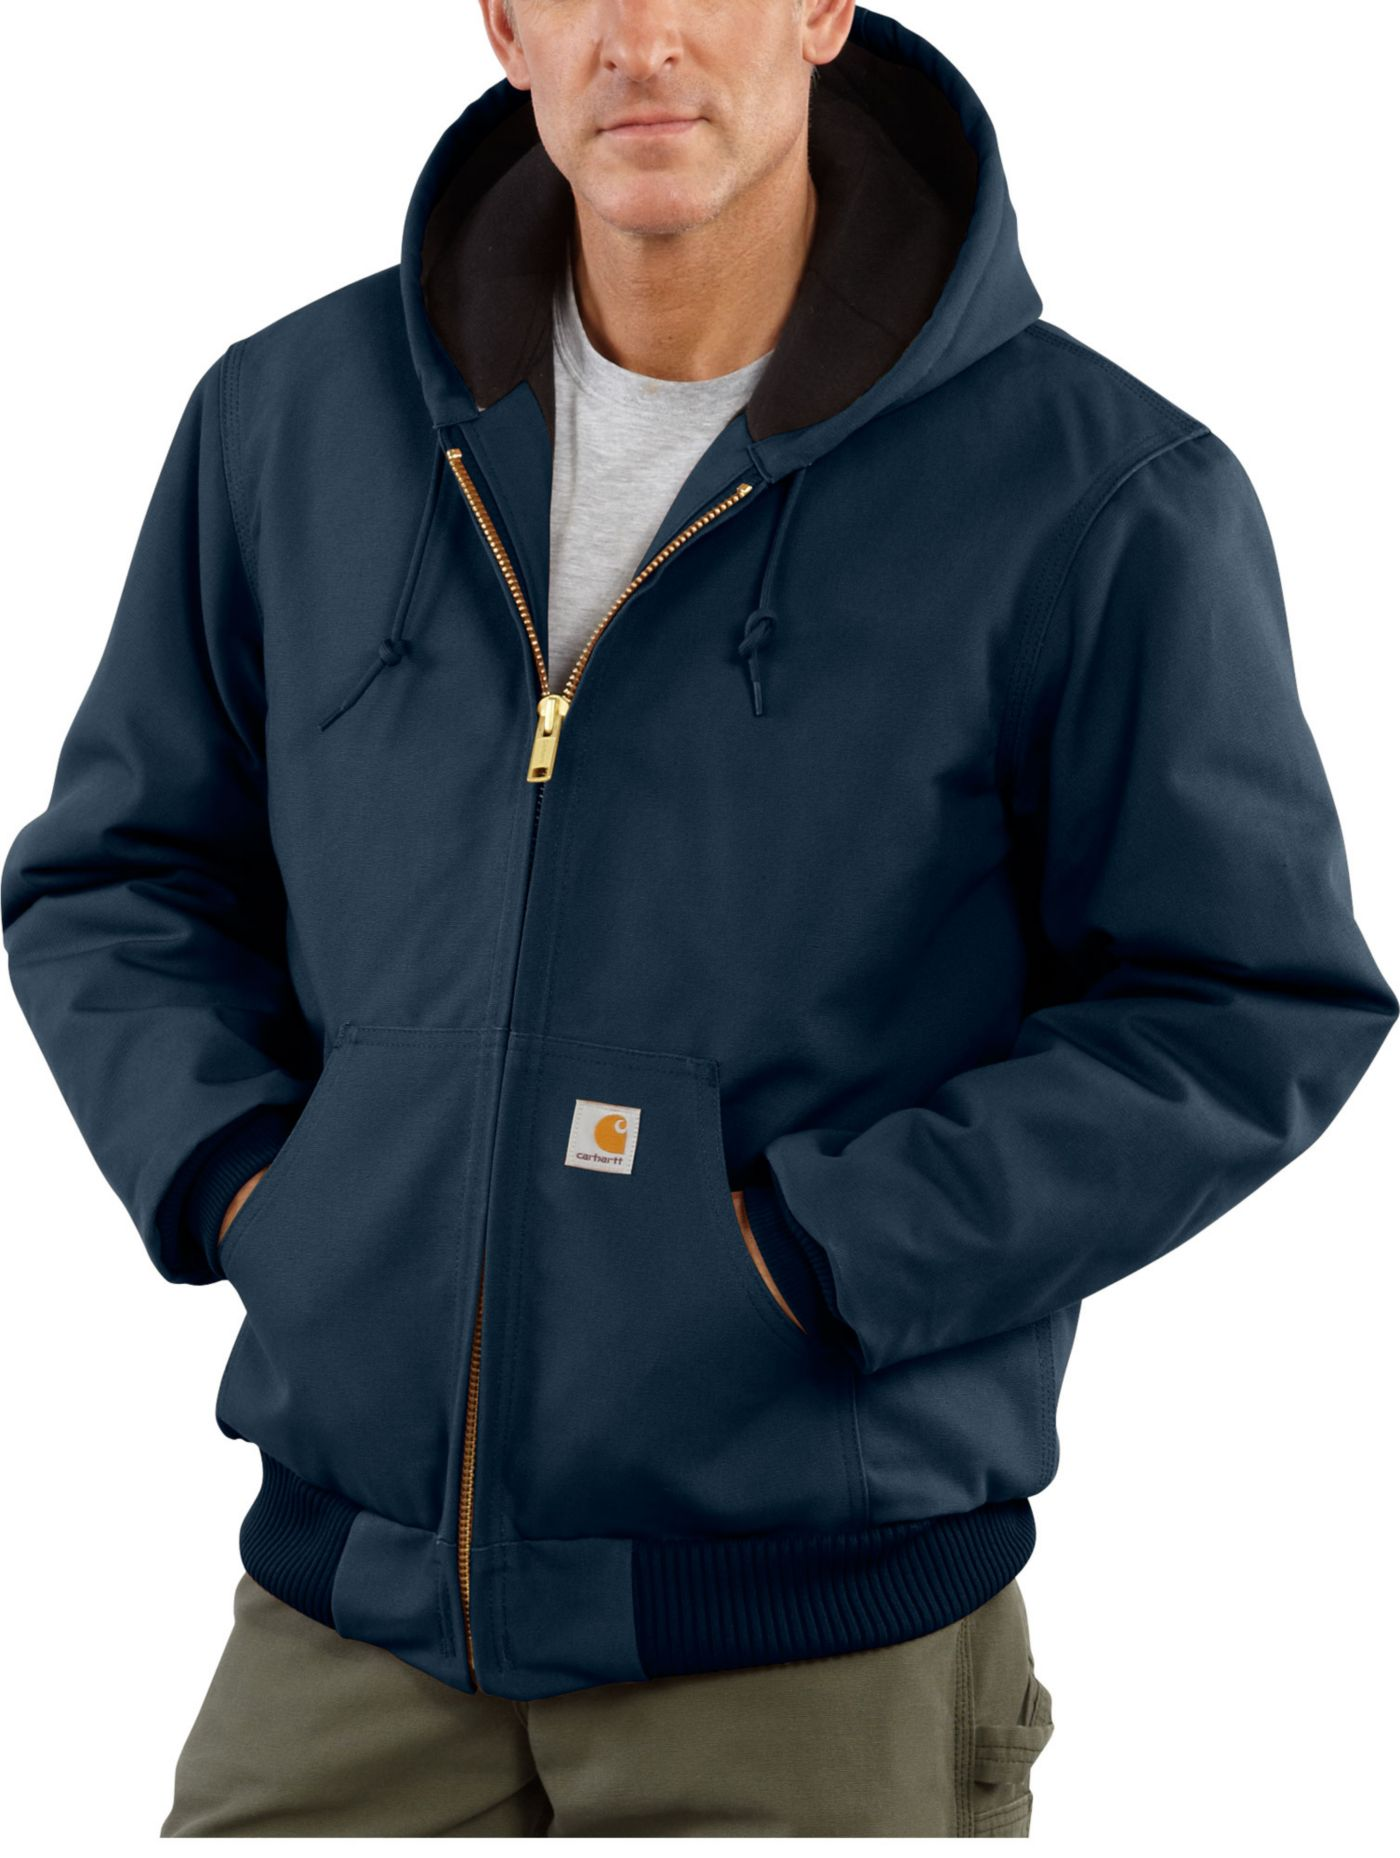 Carhartt Men's Duck Active Jacket (Regular and Big & Tall)